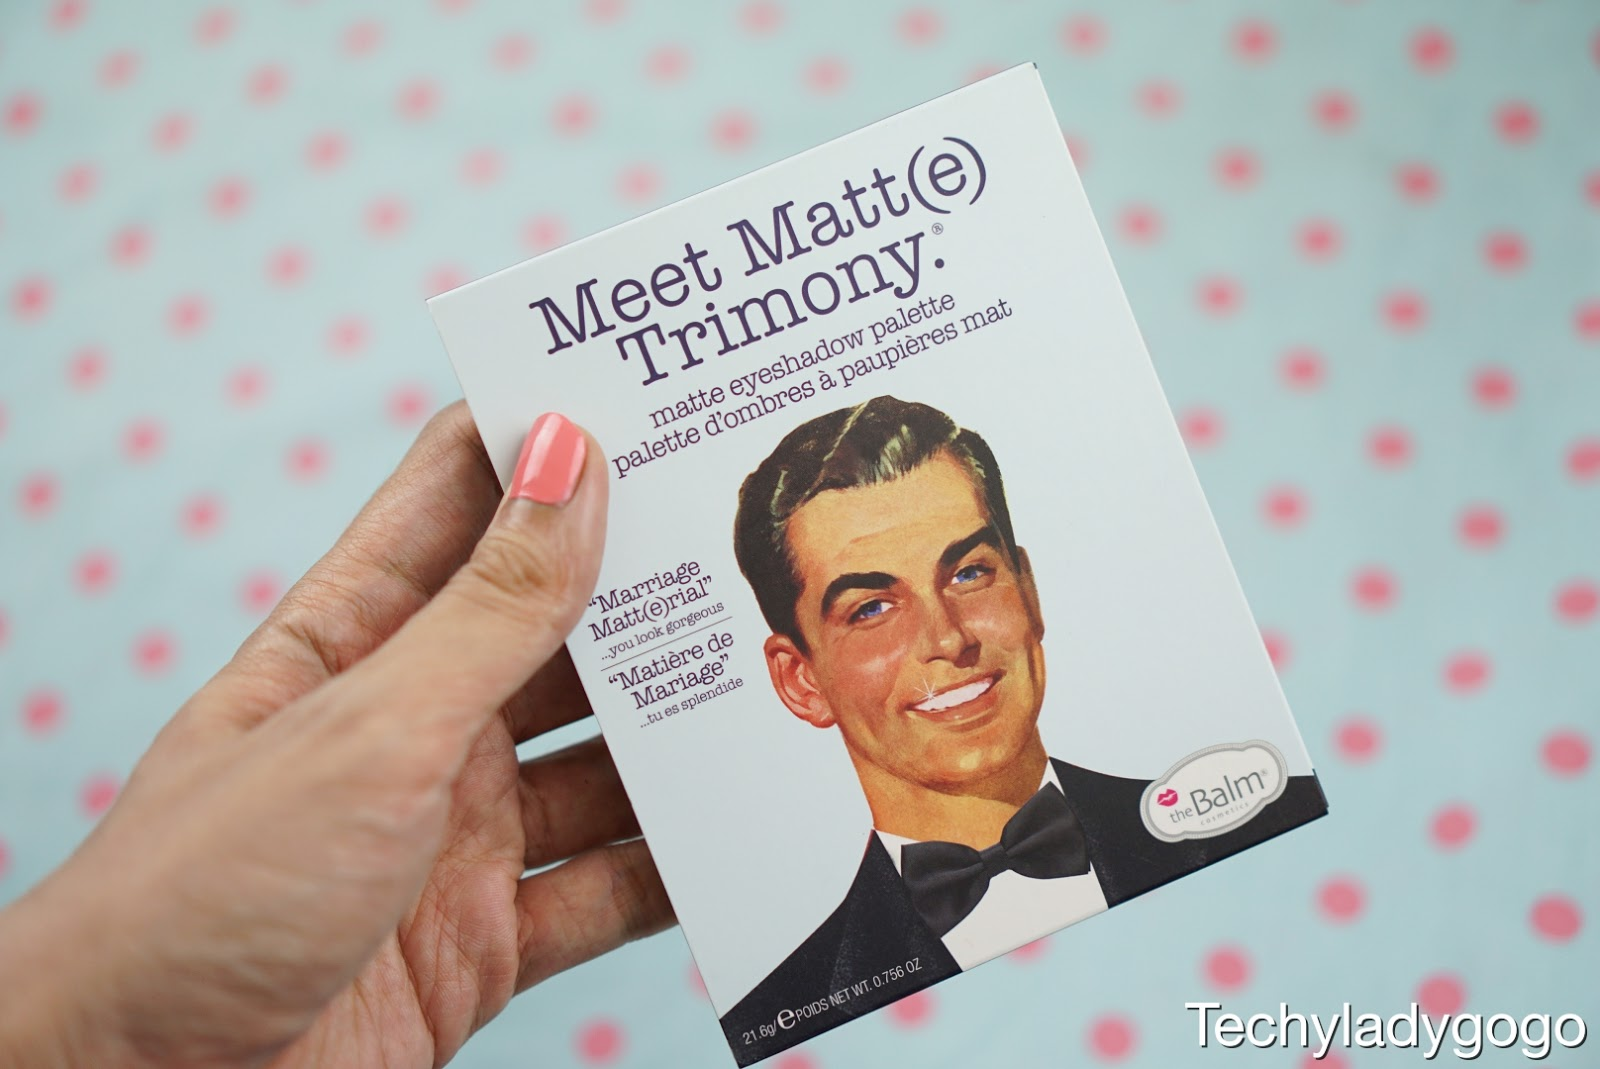 The Balm Meet Matte TRIMONY รีวิวอายชาโดว์พาเลท eyeshadow palette เนื้อแมตท์ใหม่ 9 โทนสี